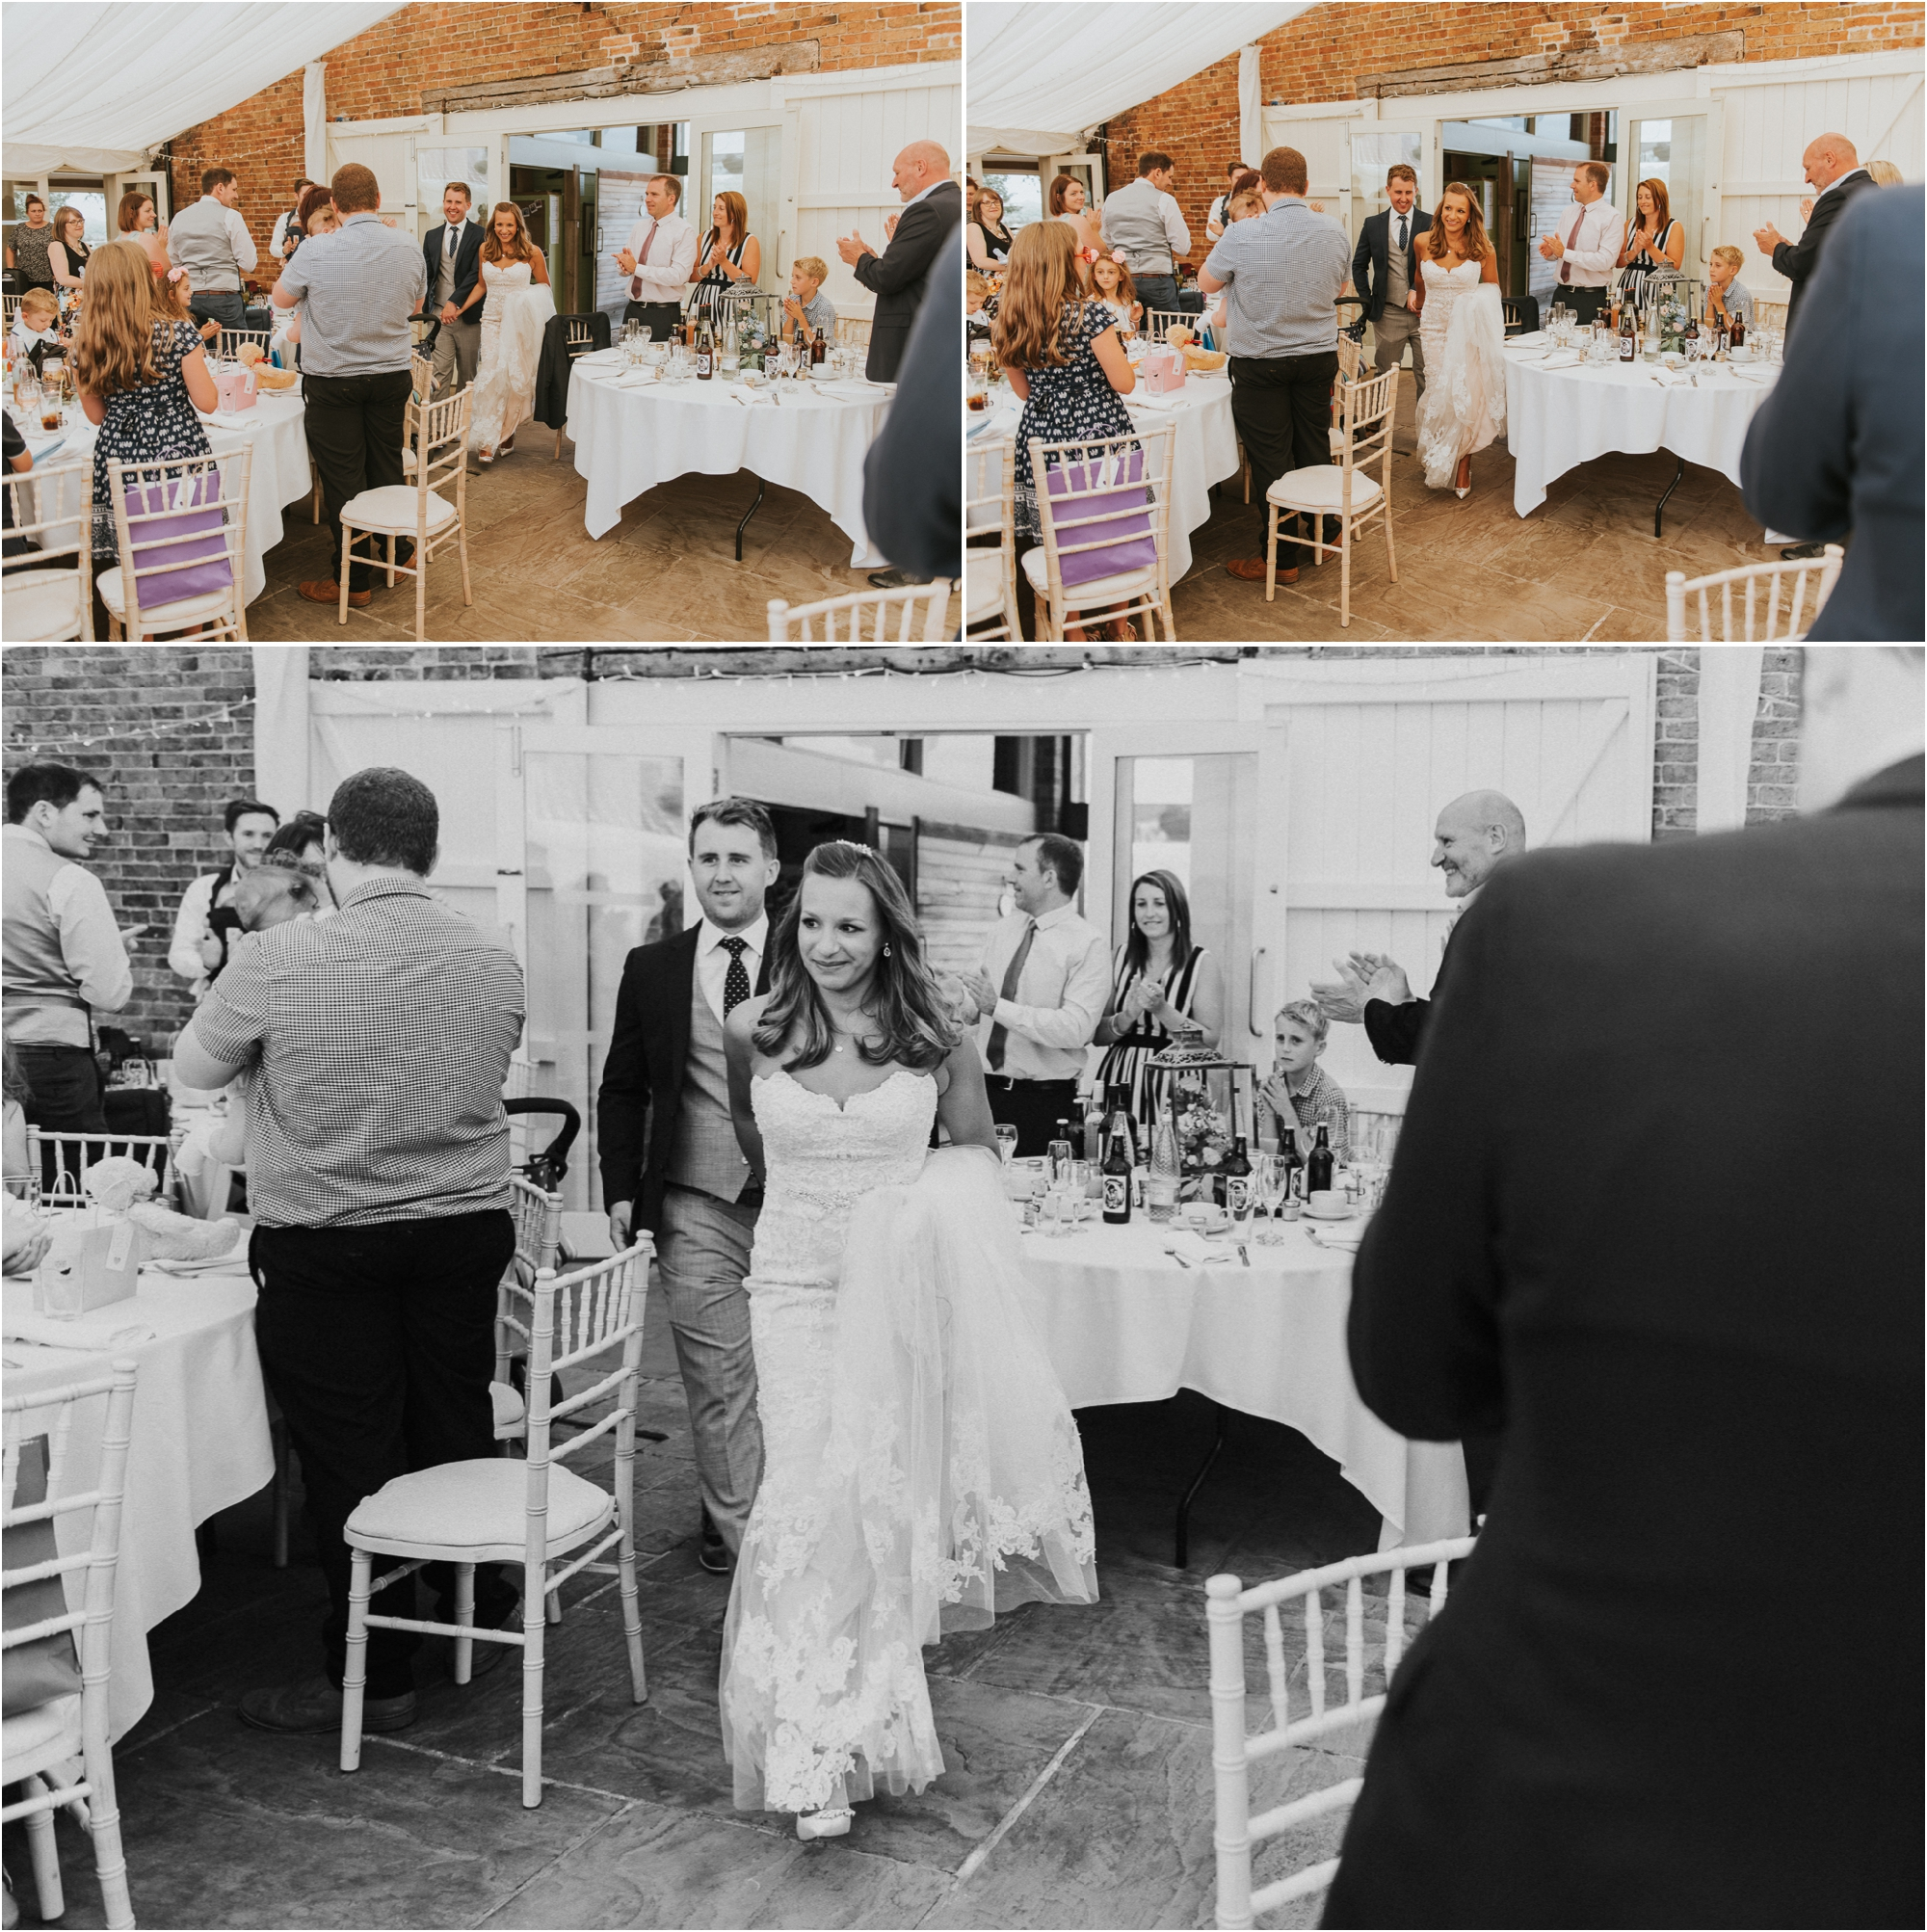 PheasantBrewery-LukeHolroyd-Yorkshirewedding_000150.jpg